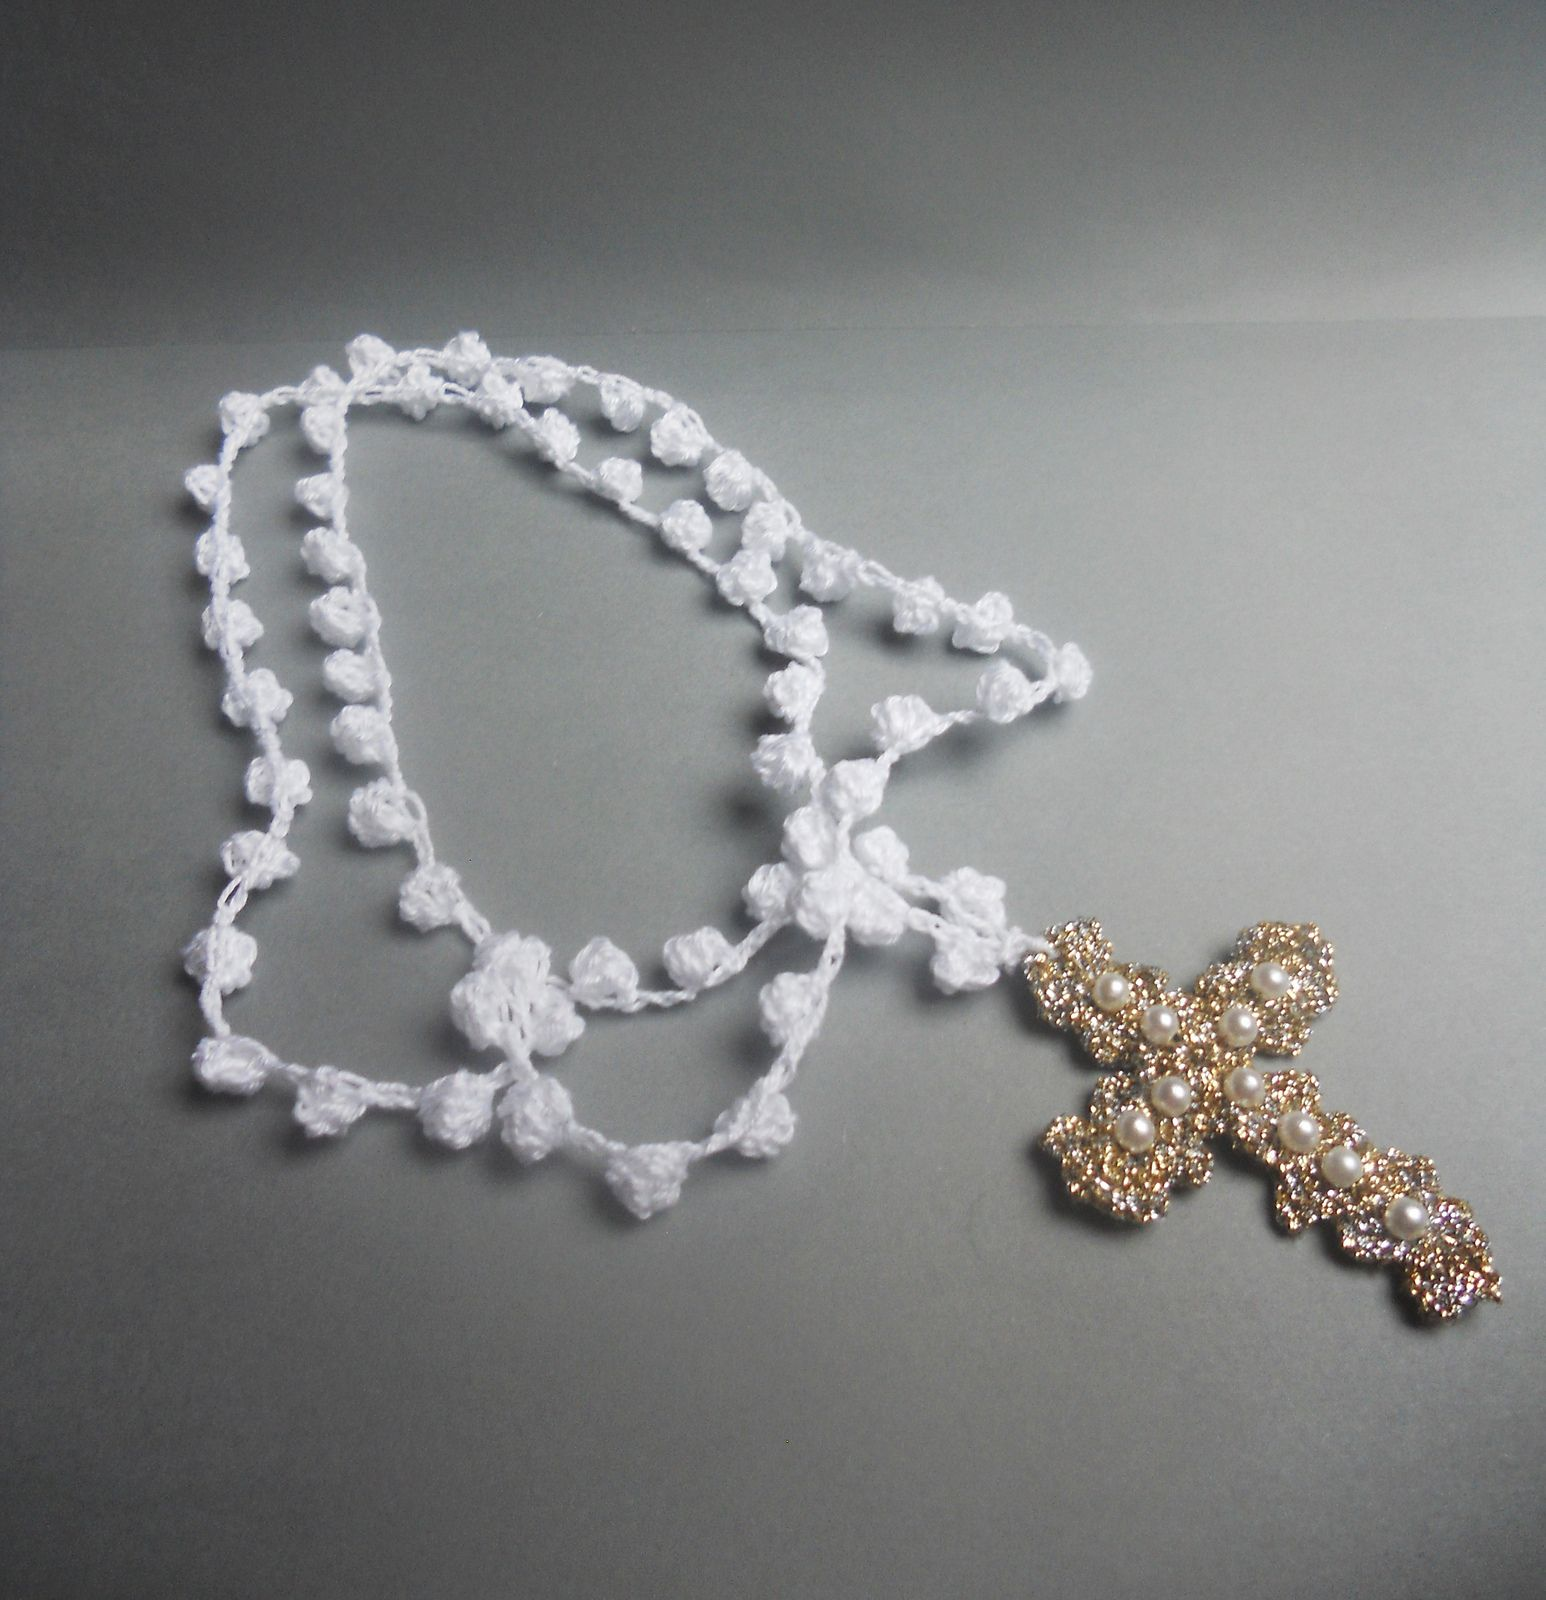 Crochet Rosary Pattern By Creativityclaudia Diy Pinterest